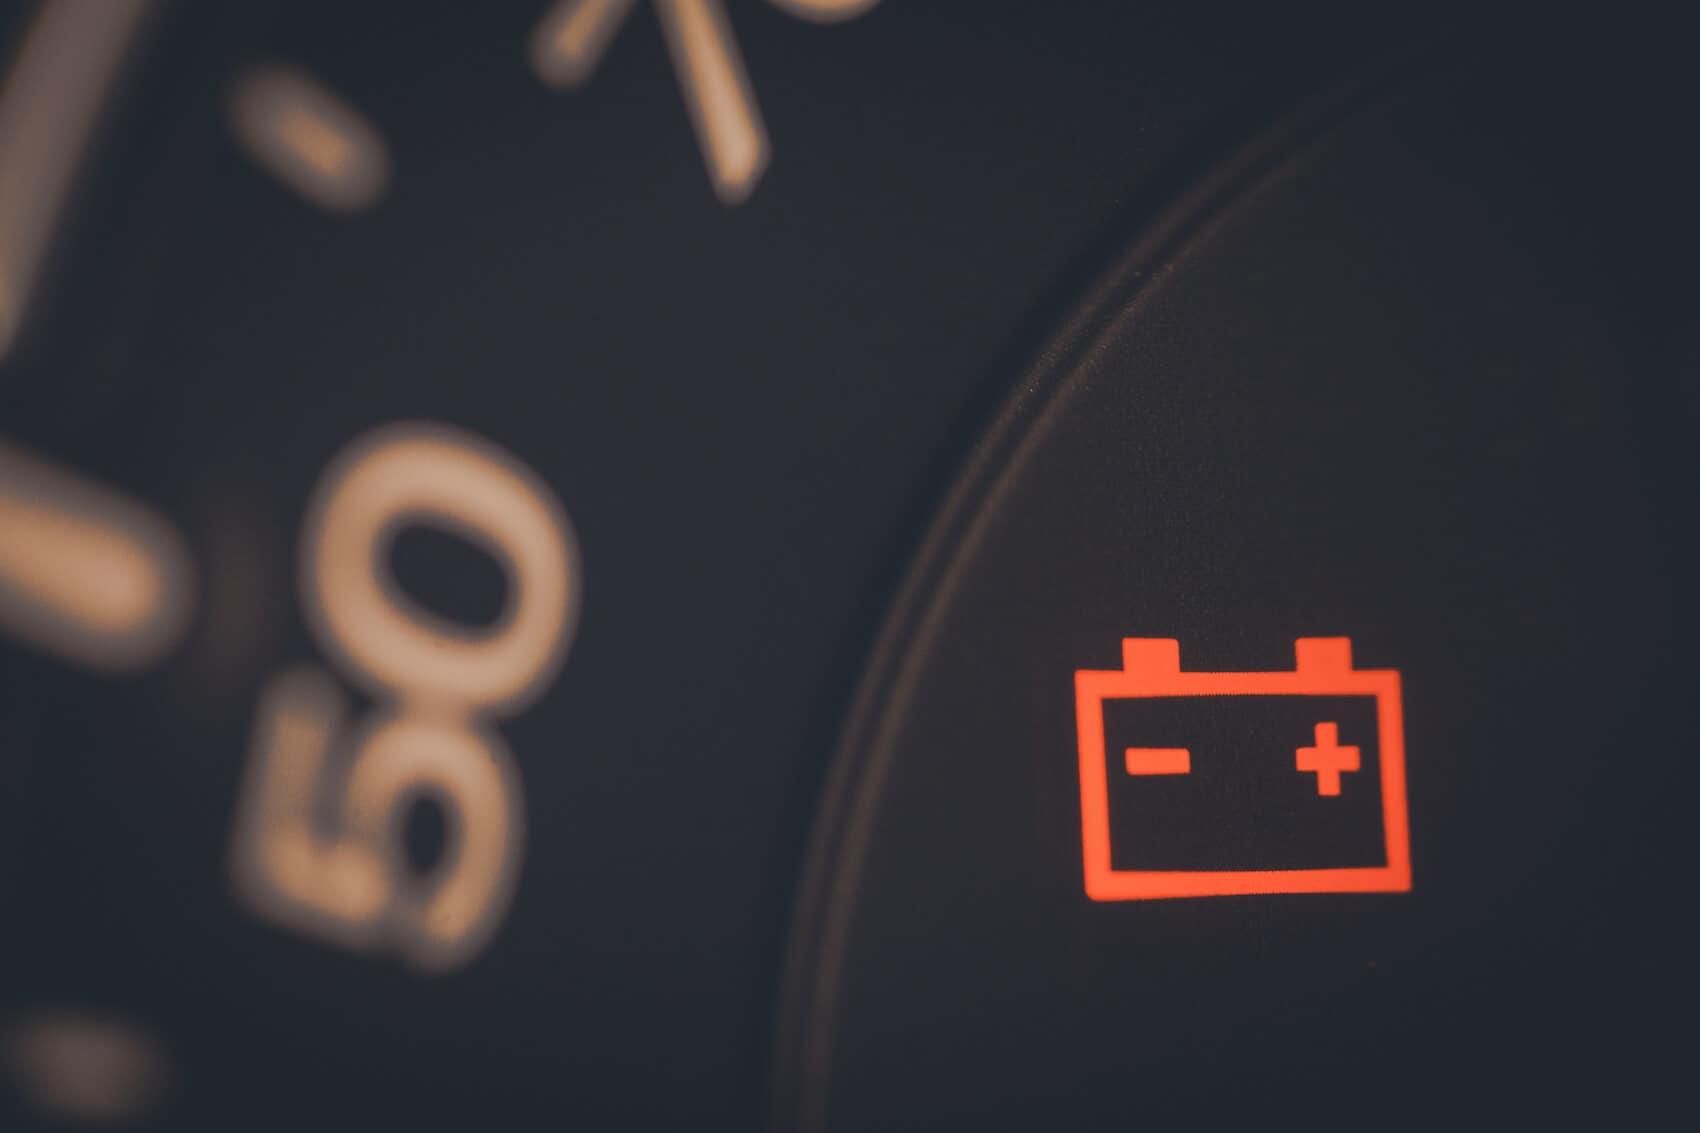 Charging System Warning Light